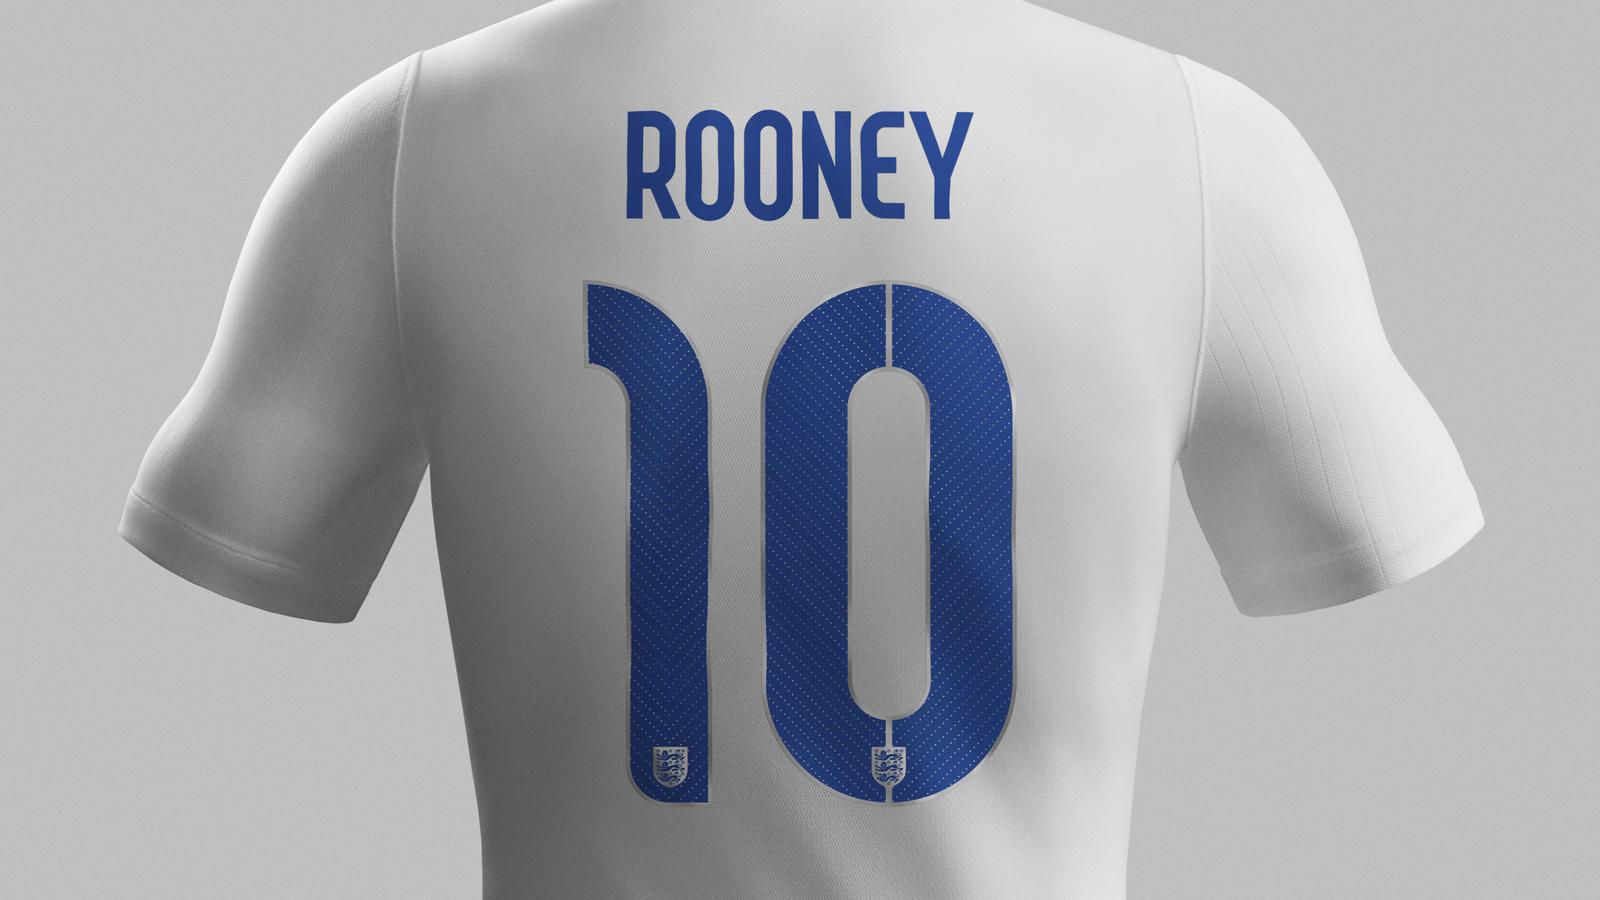 England home shirt (back)